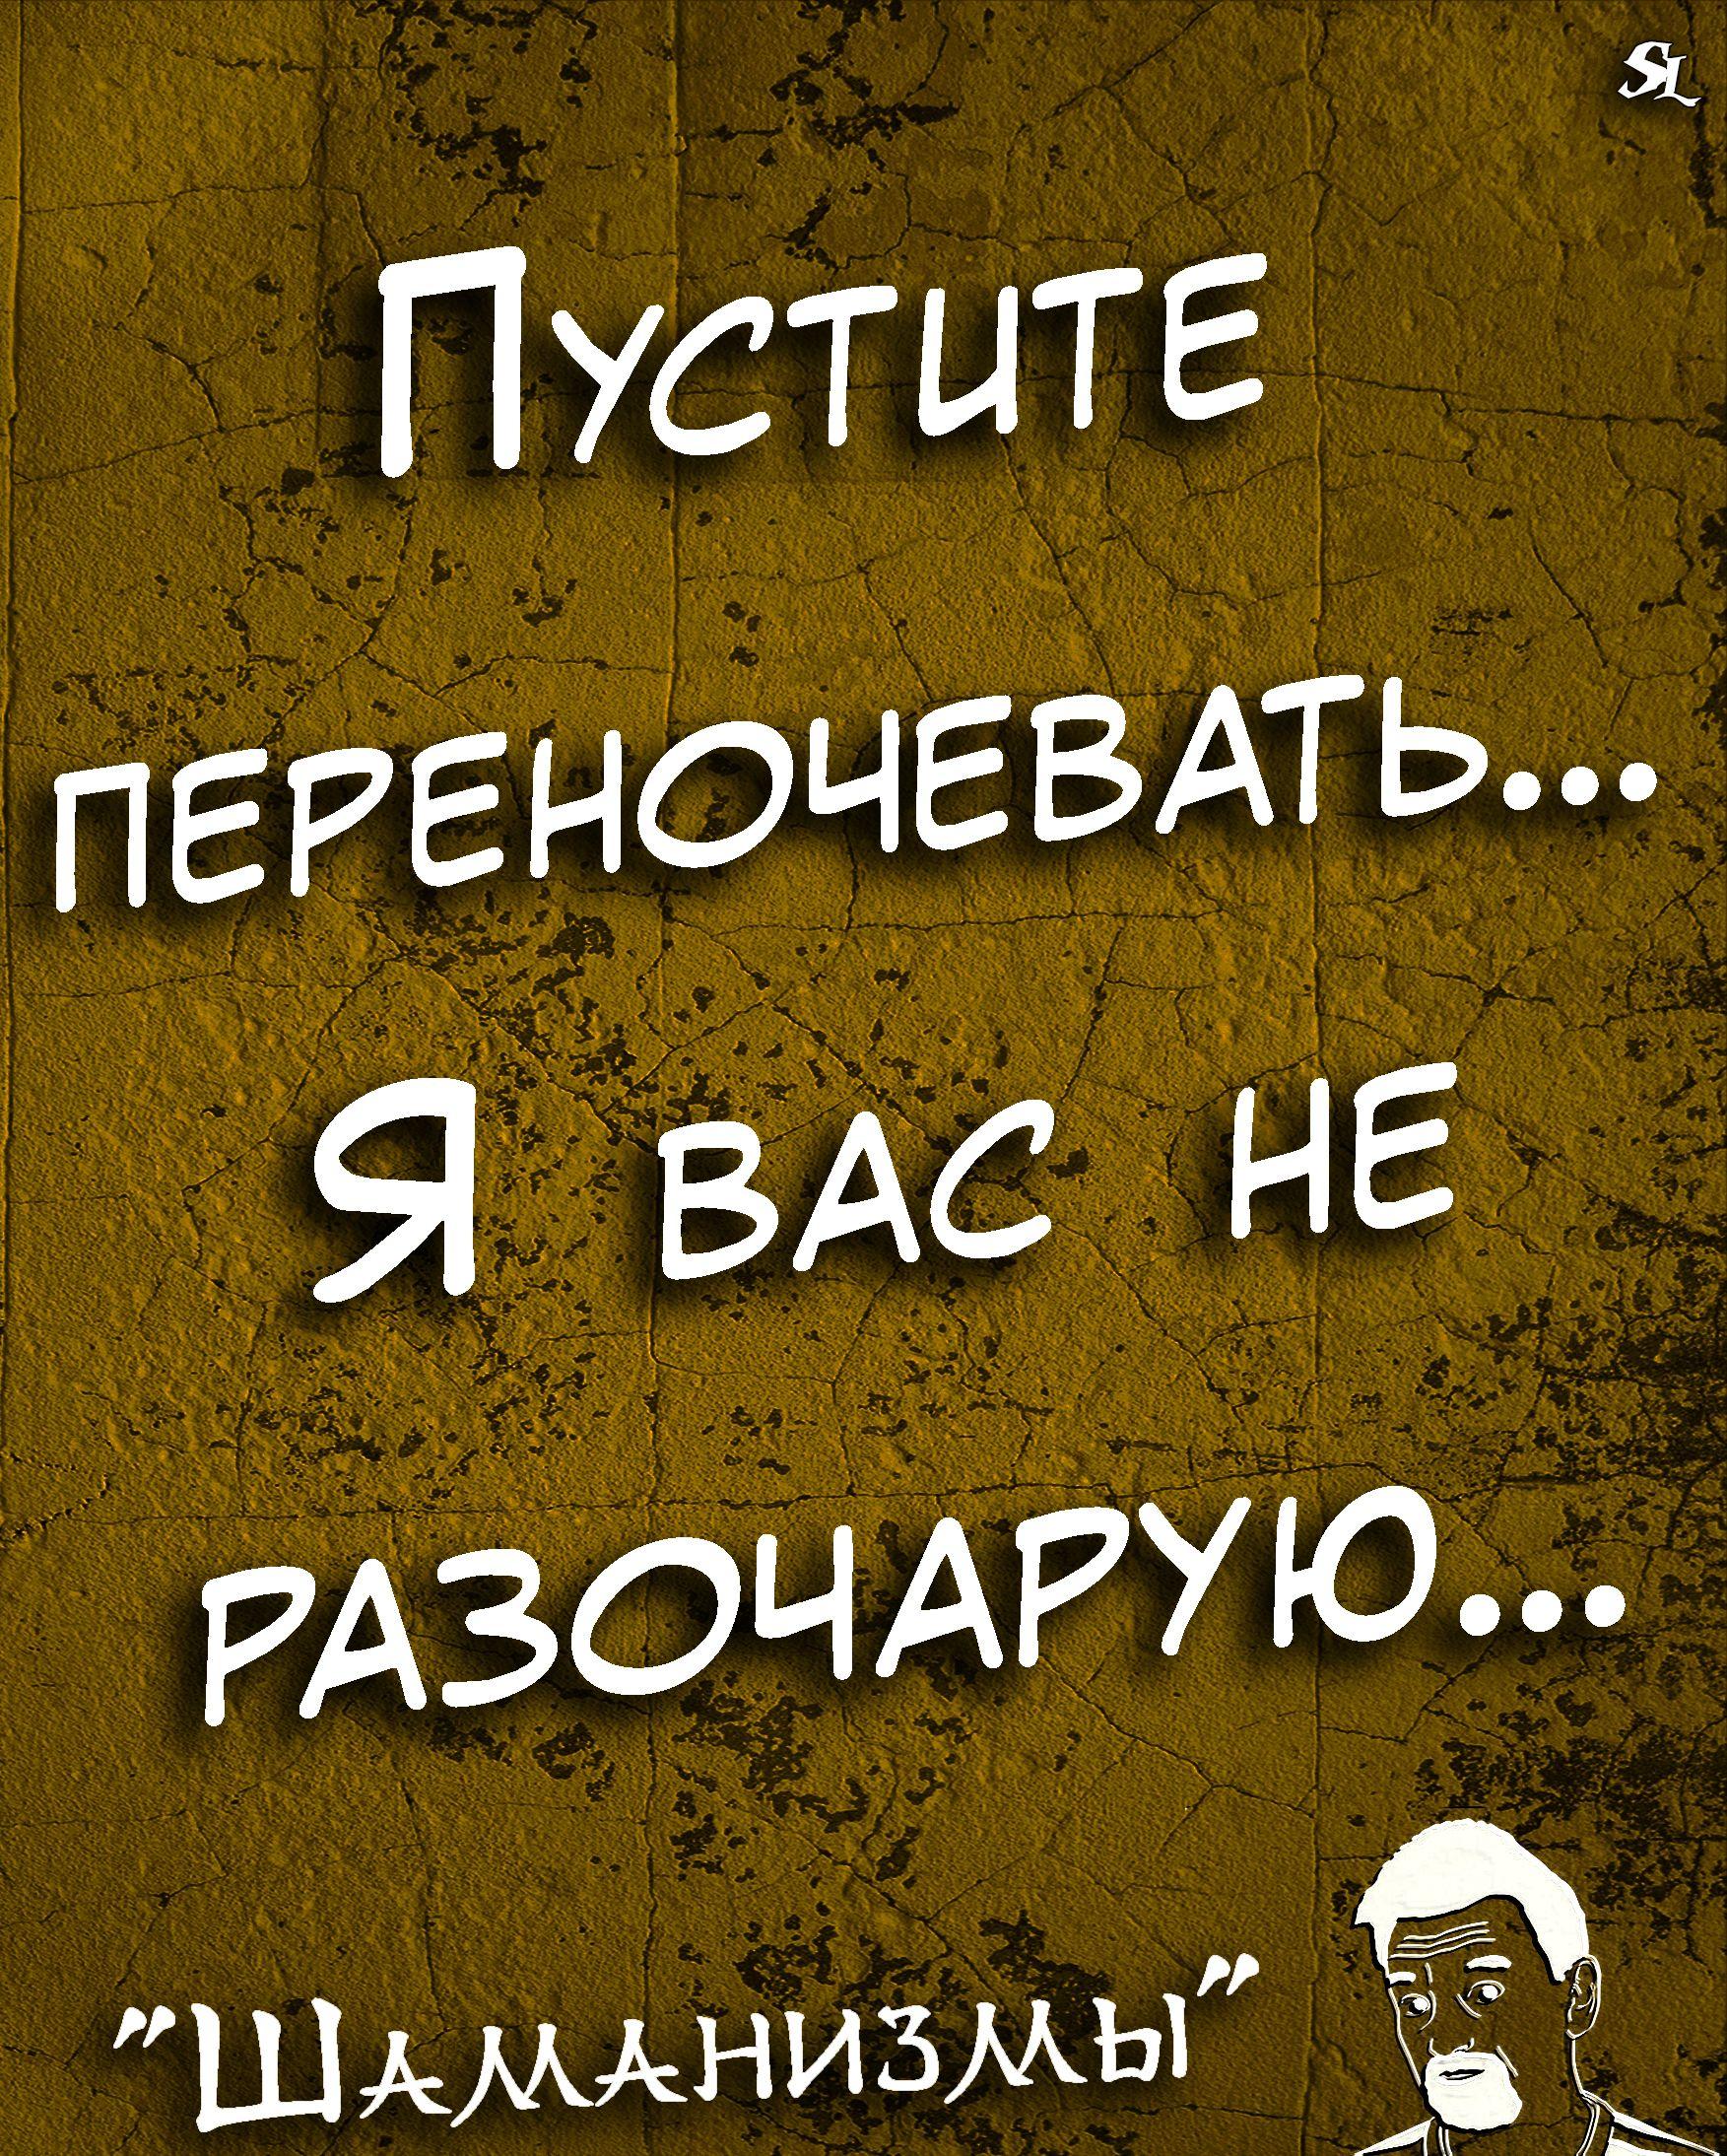 Shamanizmy Shutki Prikol Yumor Jokes Funny Humor Memes Phrase Of The Day Quotations Quotes